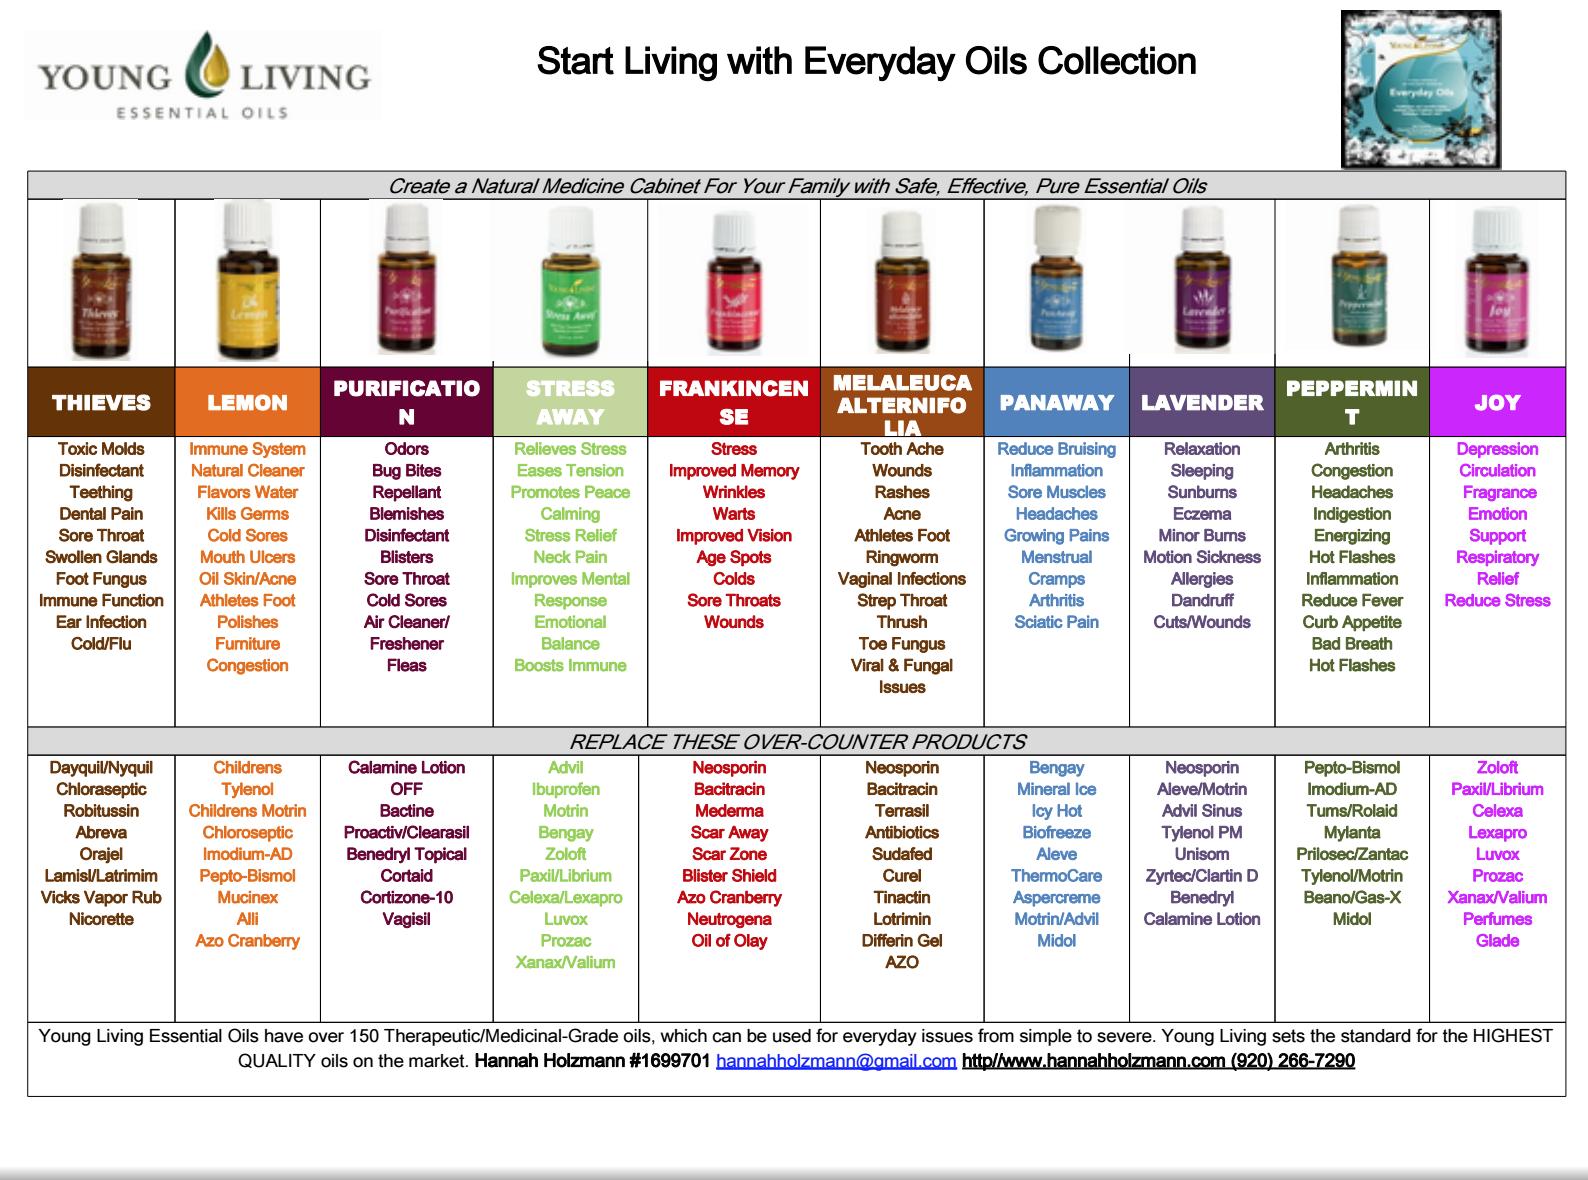 best 25 essential oil starter kit ideas on pinterest young living oils young living premium. Black Bedroom Furniture Sets. Home Design Ideas